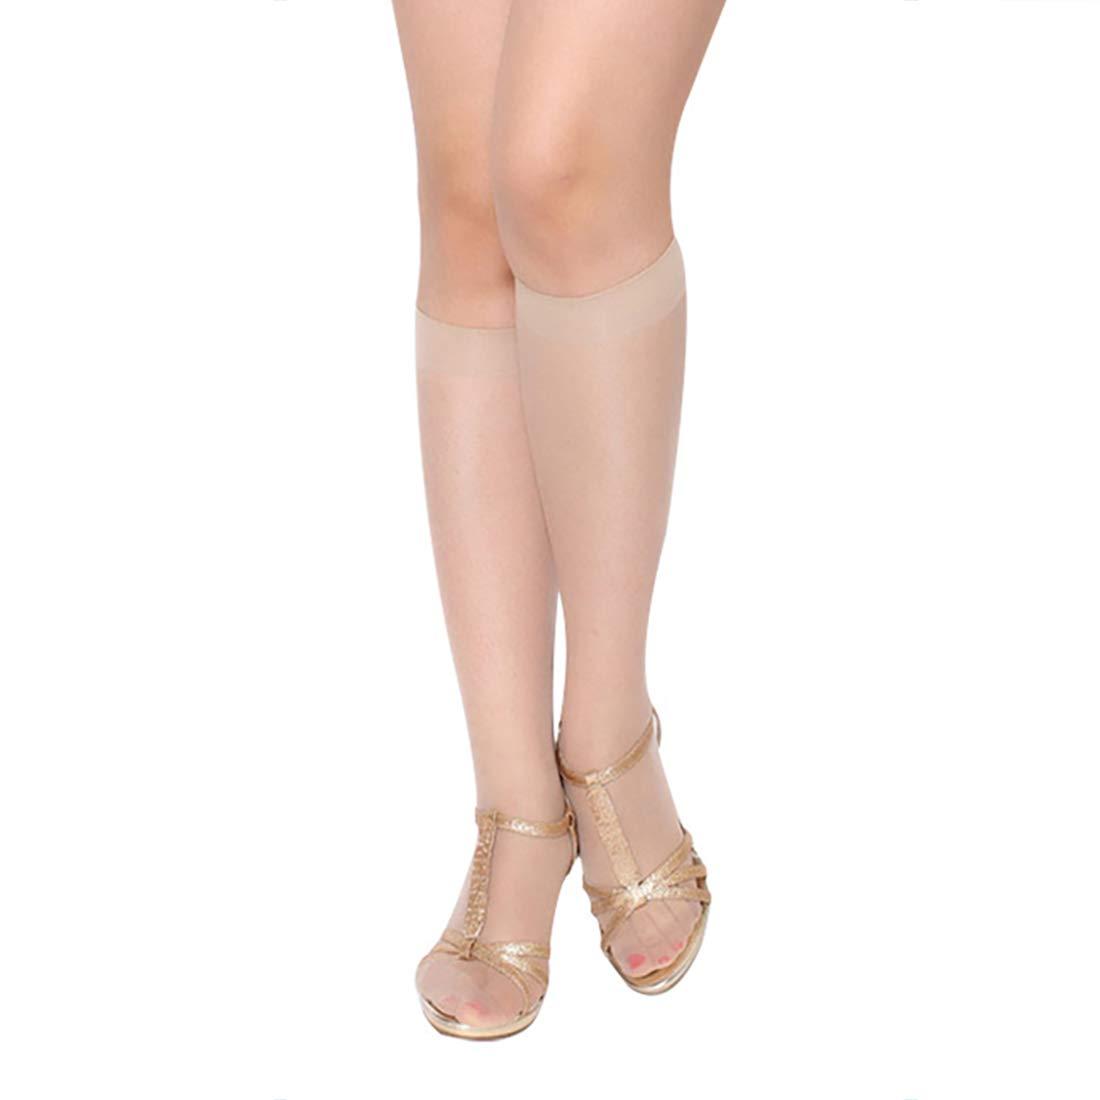 Durio 10 Pairs Knee High Socks Sheer Stockings Silky Pantyhose Soft Lace Nylon Dress Socks for Women